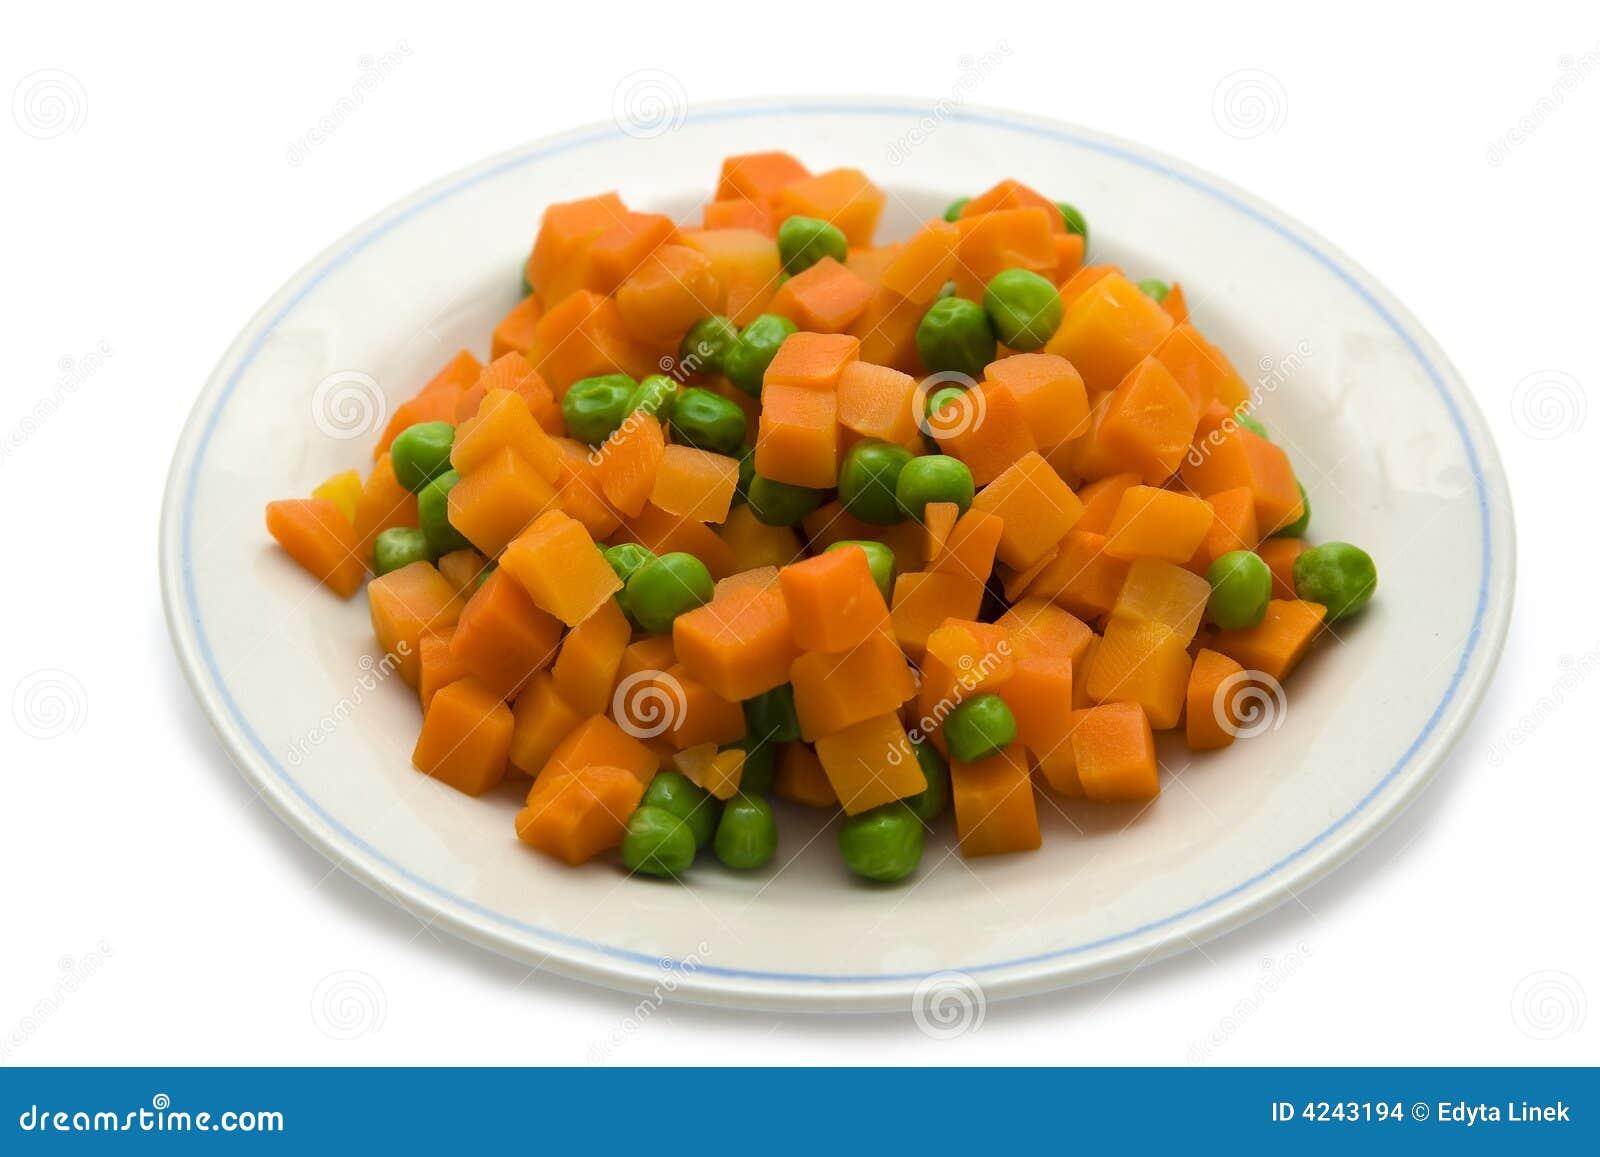 Cenoura e ervilhas verdes